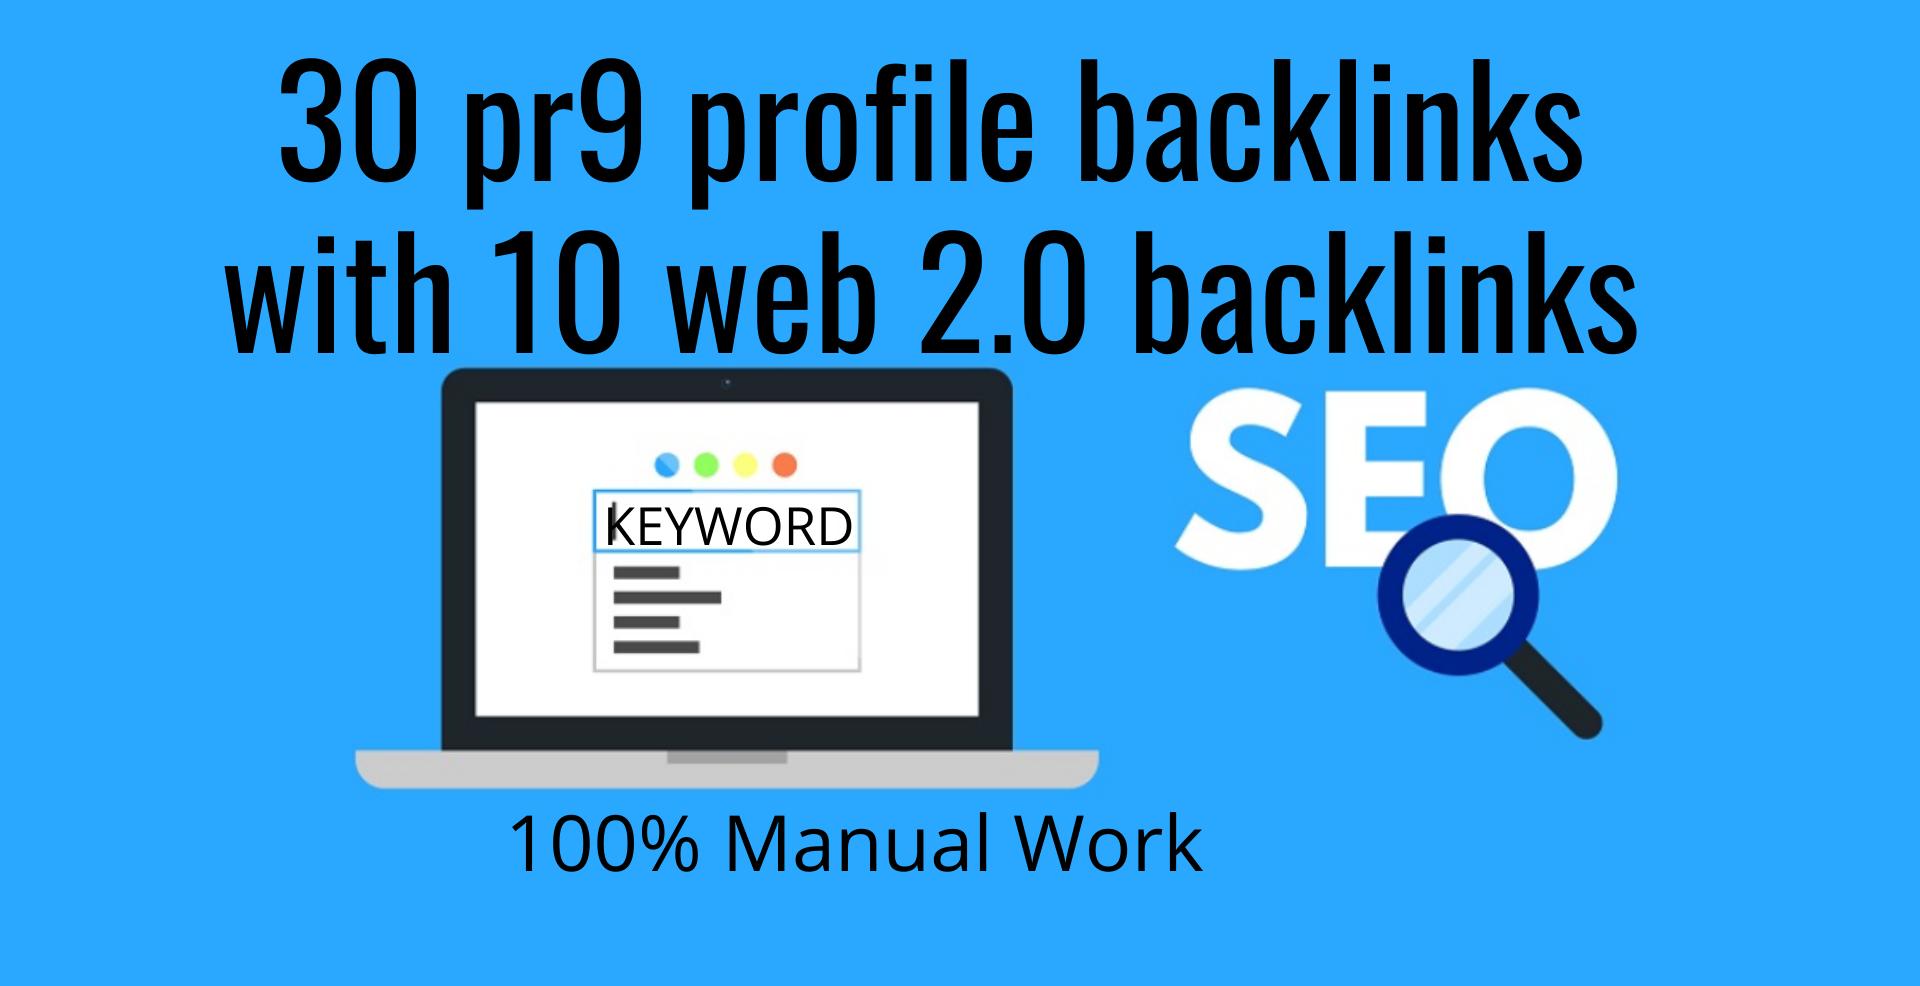 create 30 pr9 profile backlinks with 10 web 2.0 backlinks